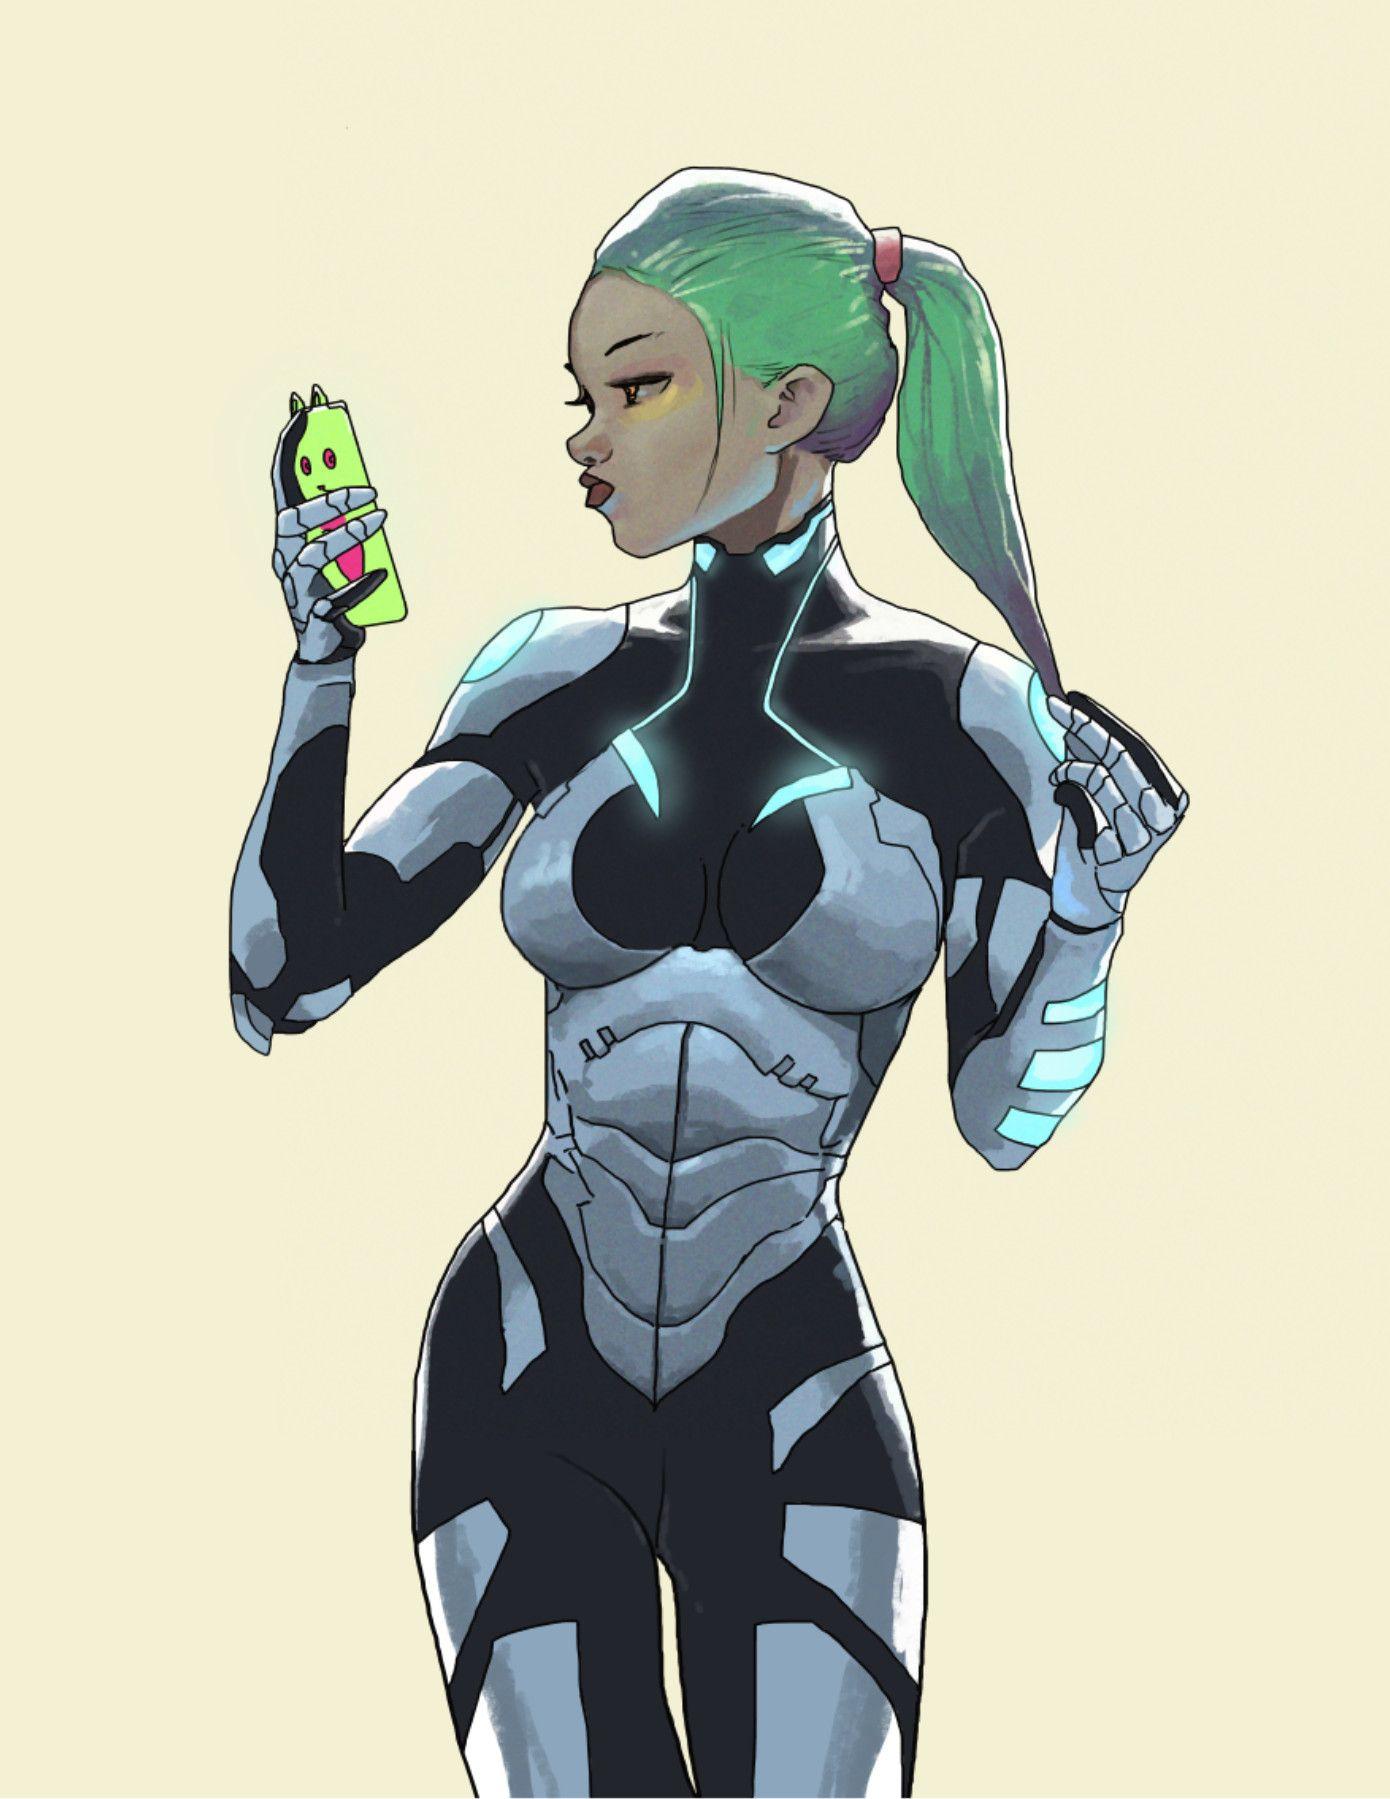 Gamora by Dave Seguin on ArtStation.